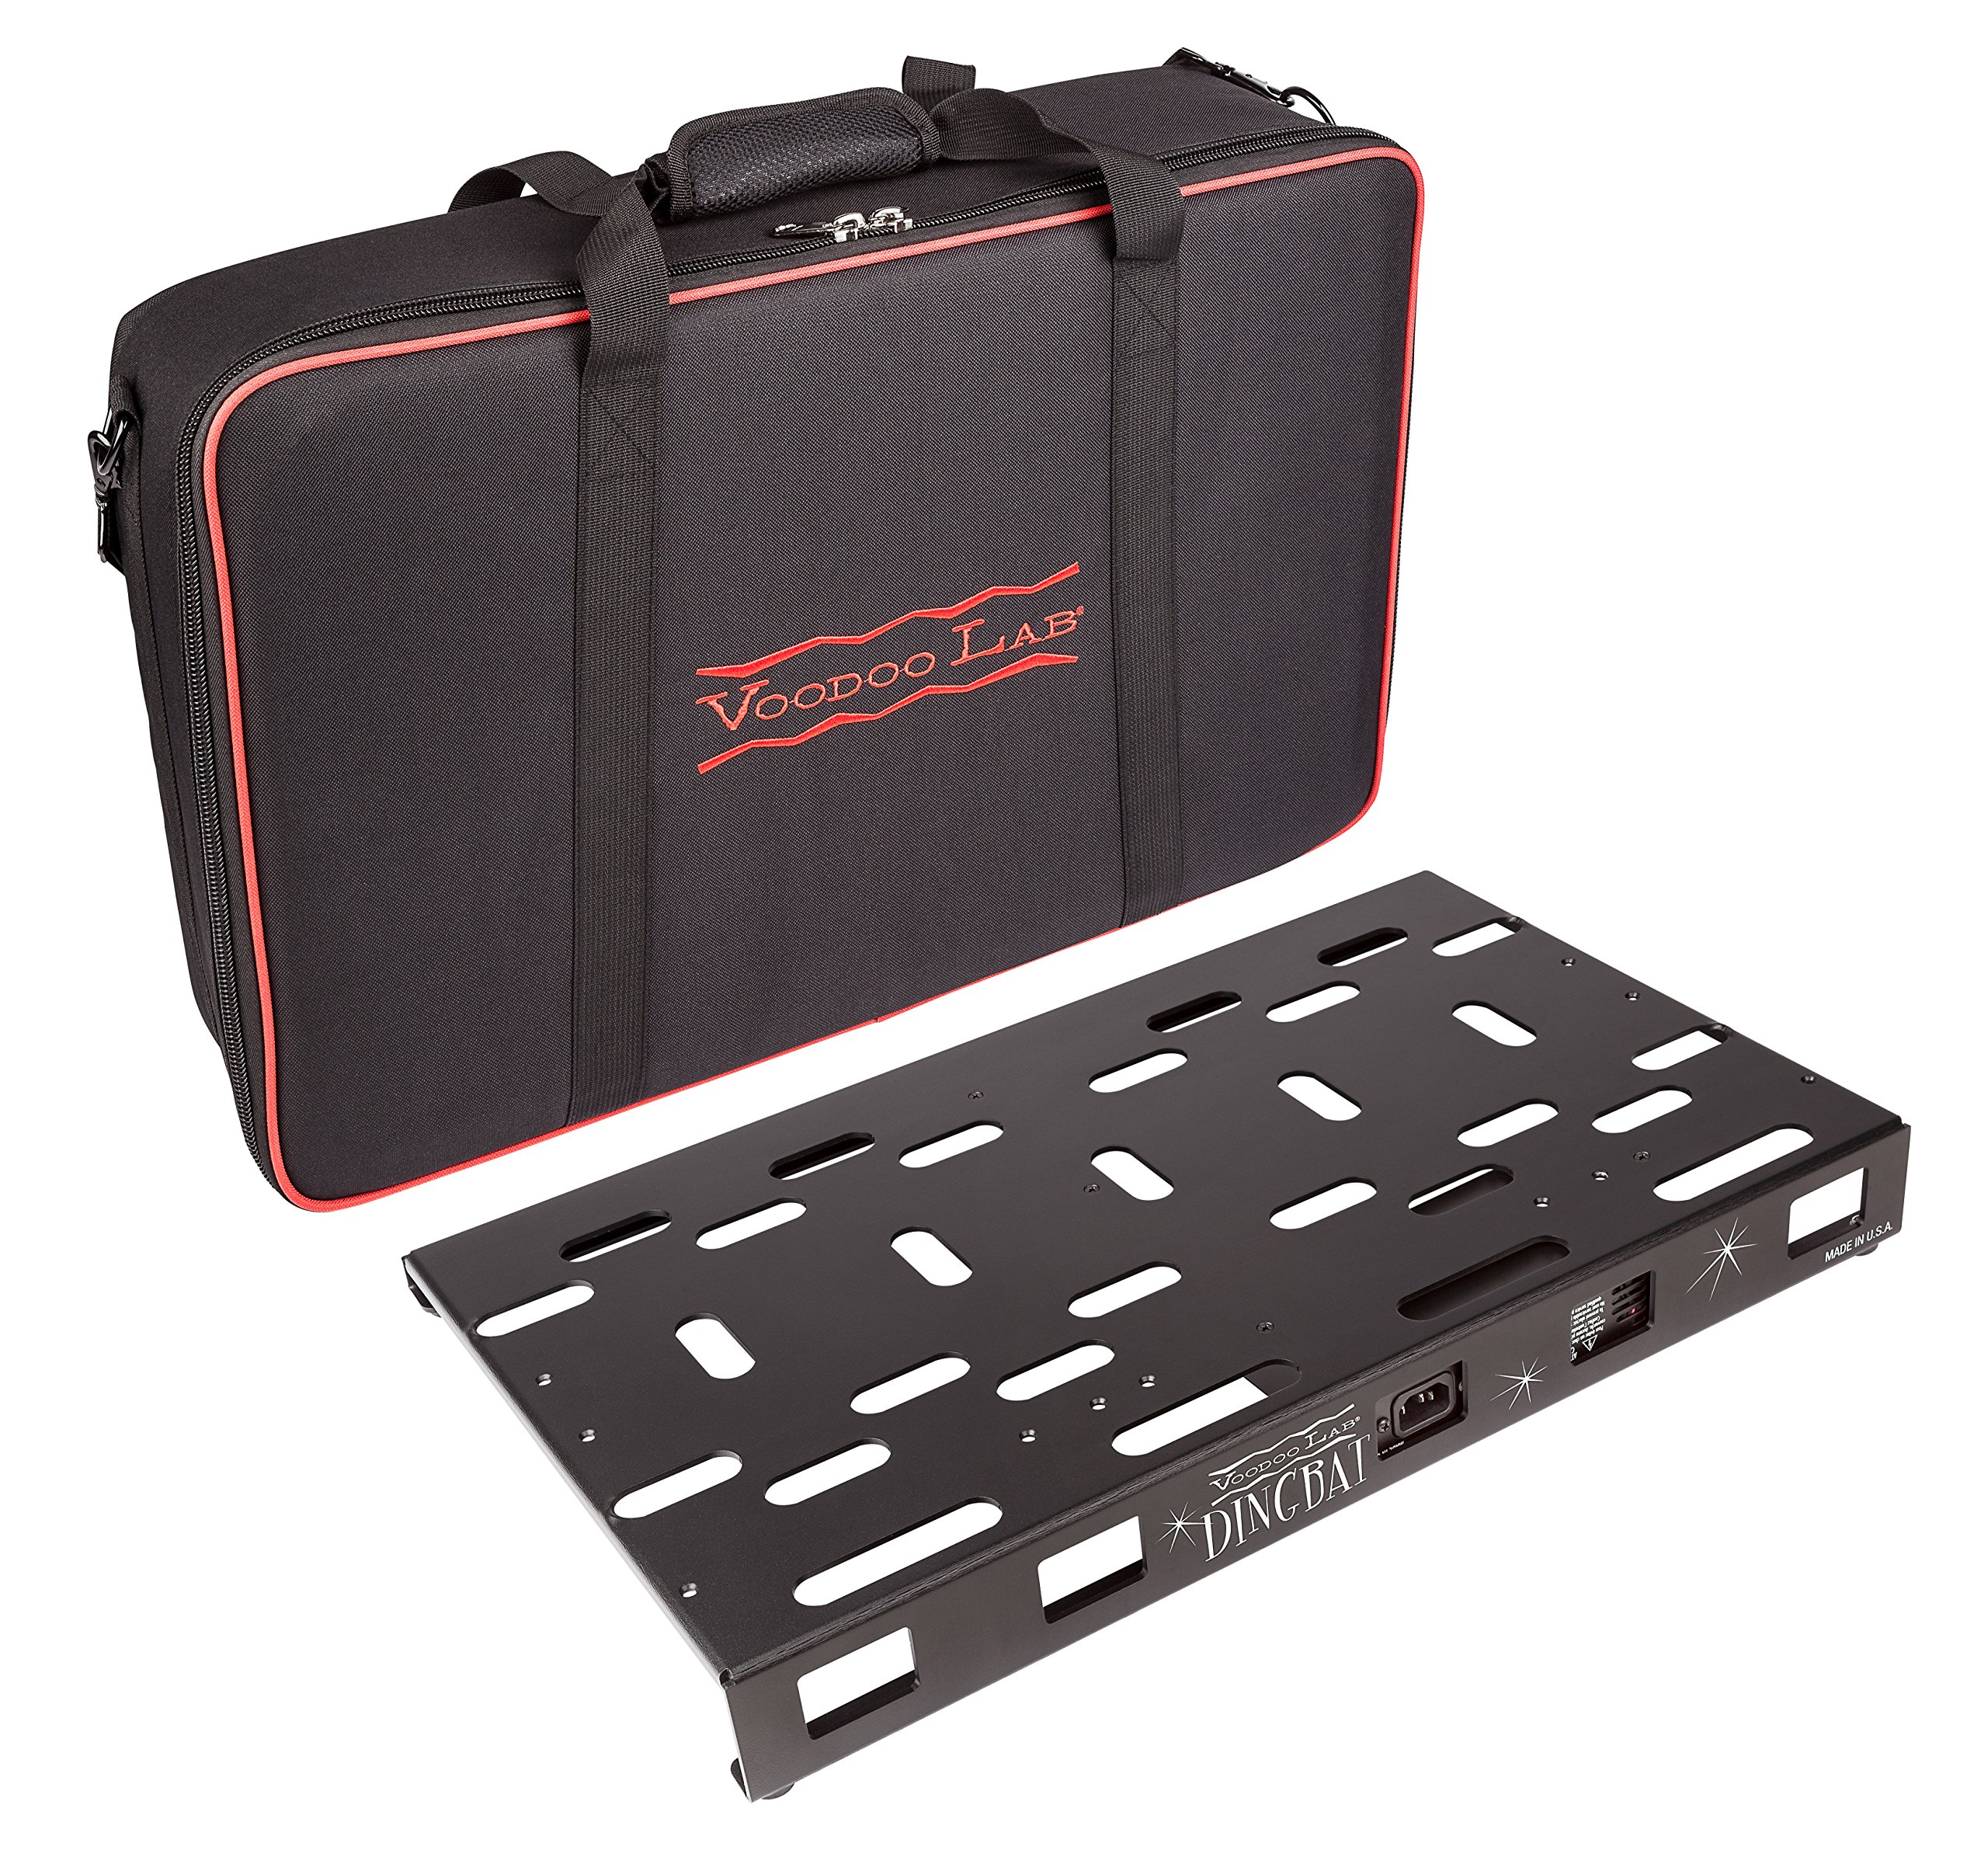 Voodoo Lab Dingbat Medium Pedalboard with Pedal Power 4x4 Power Supply & Bag